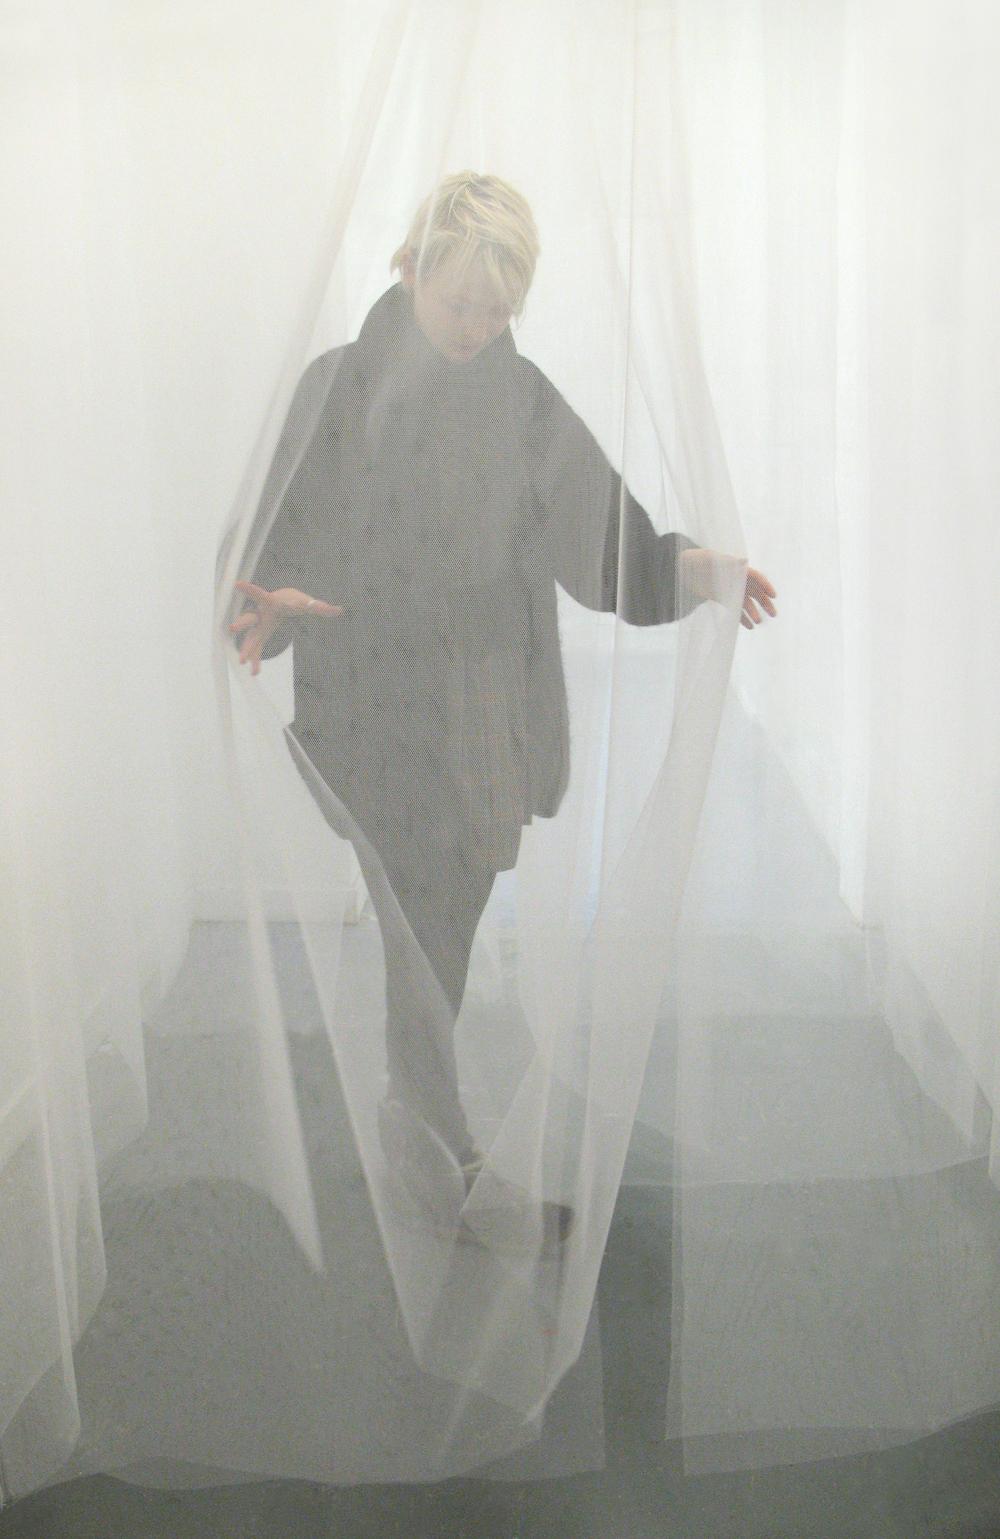 Pia Männikkö: Verges, 2011